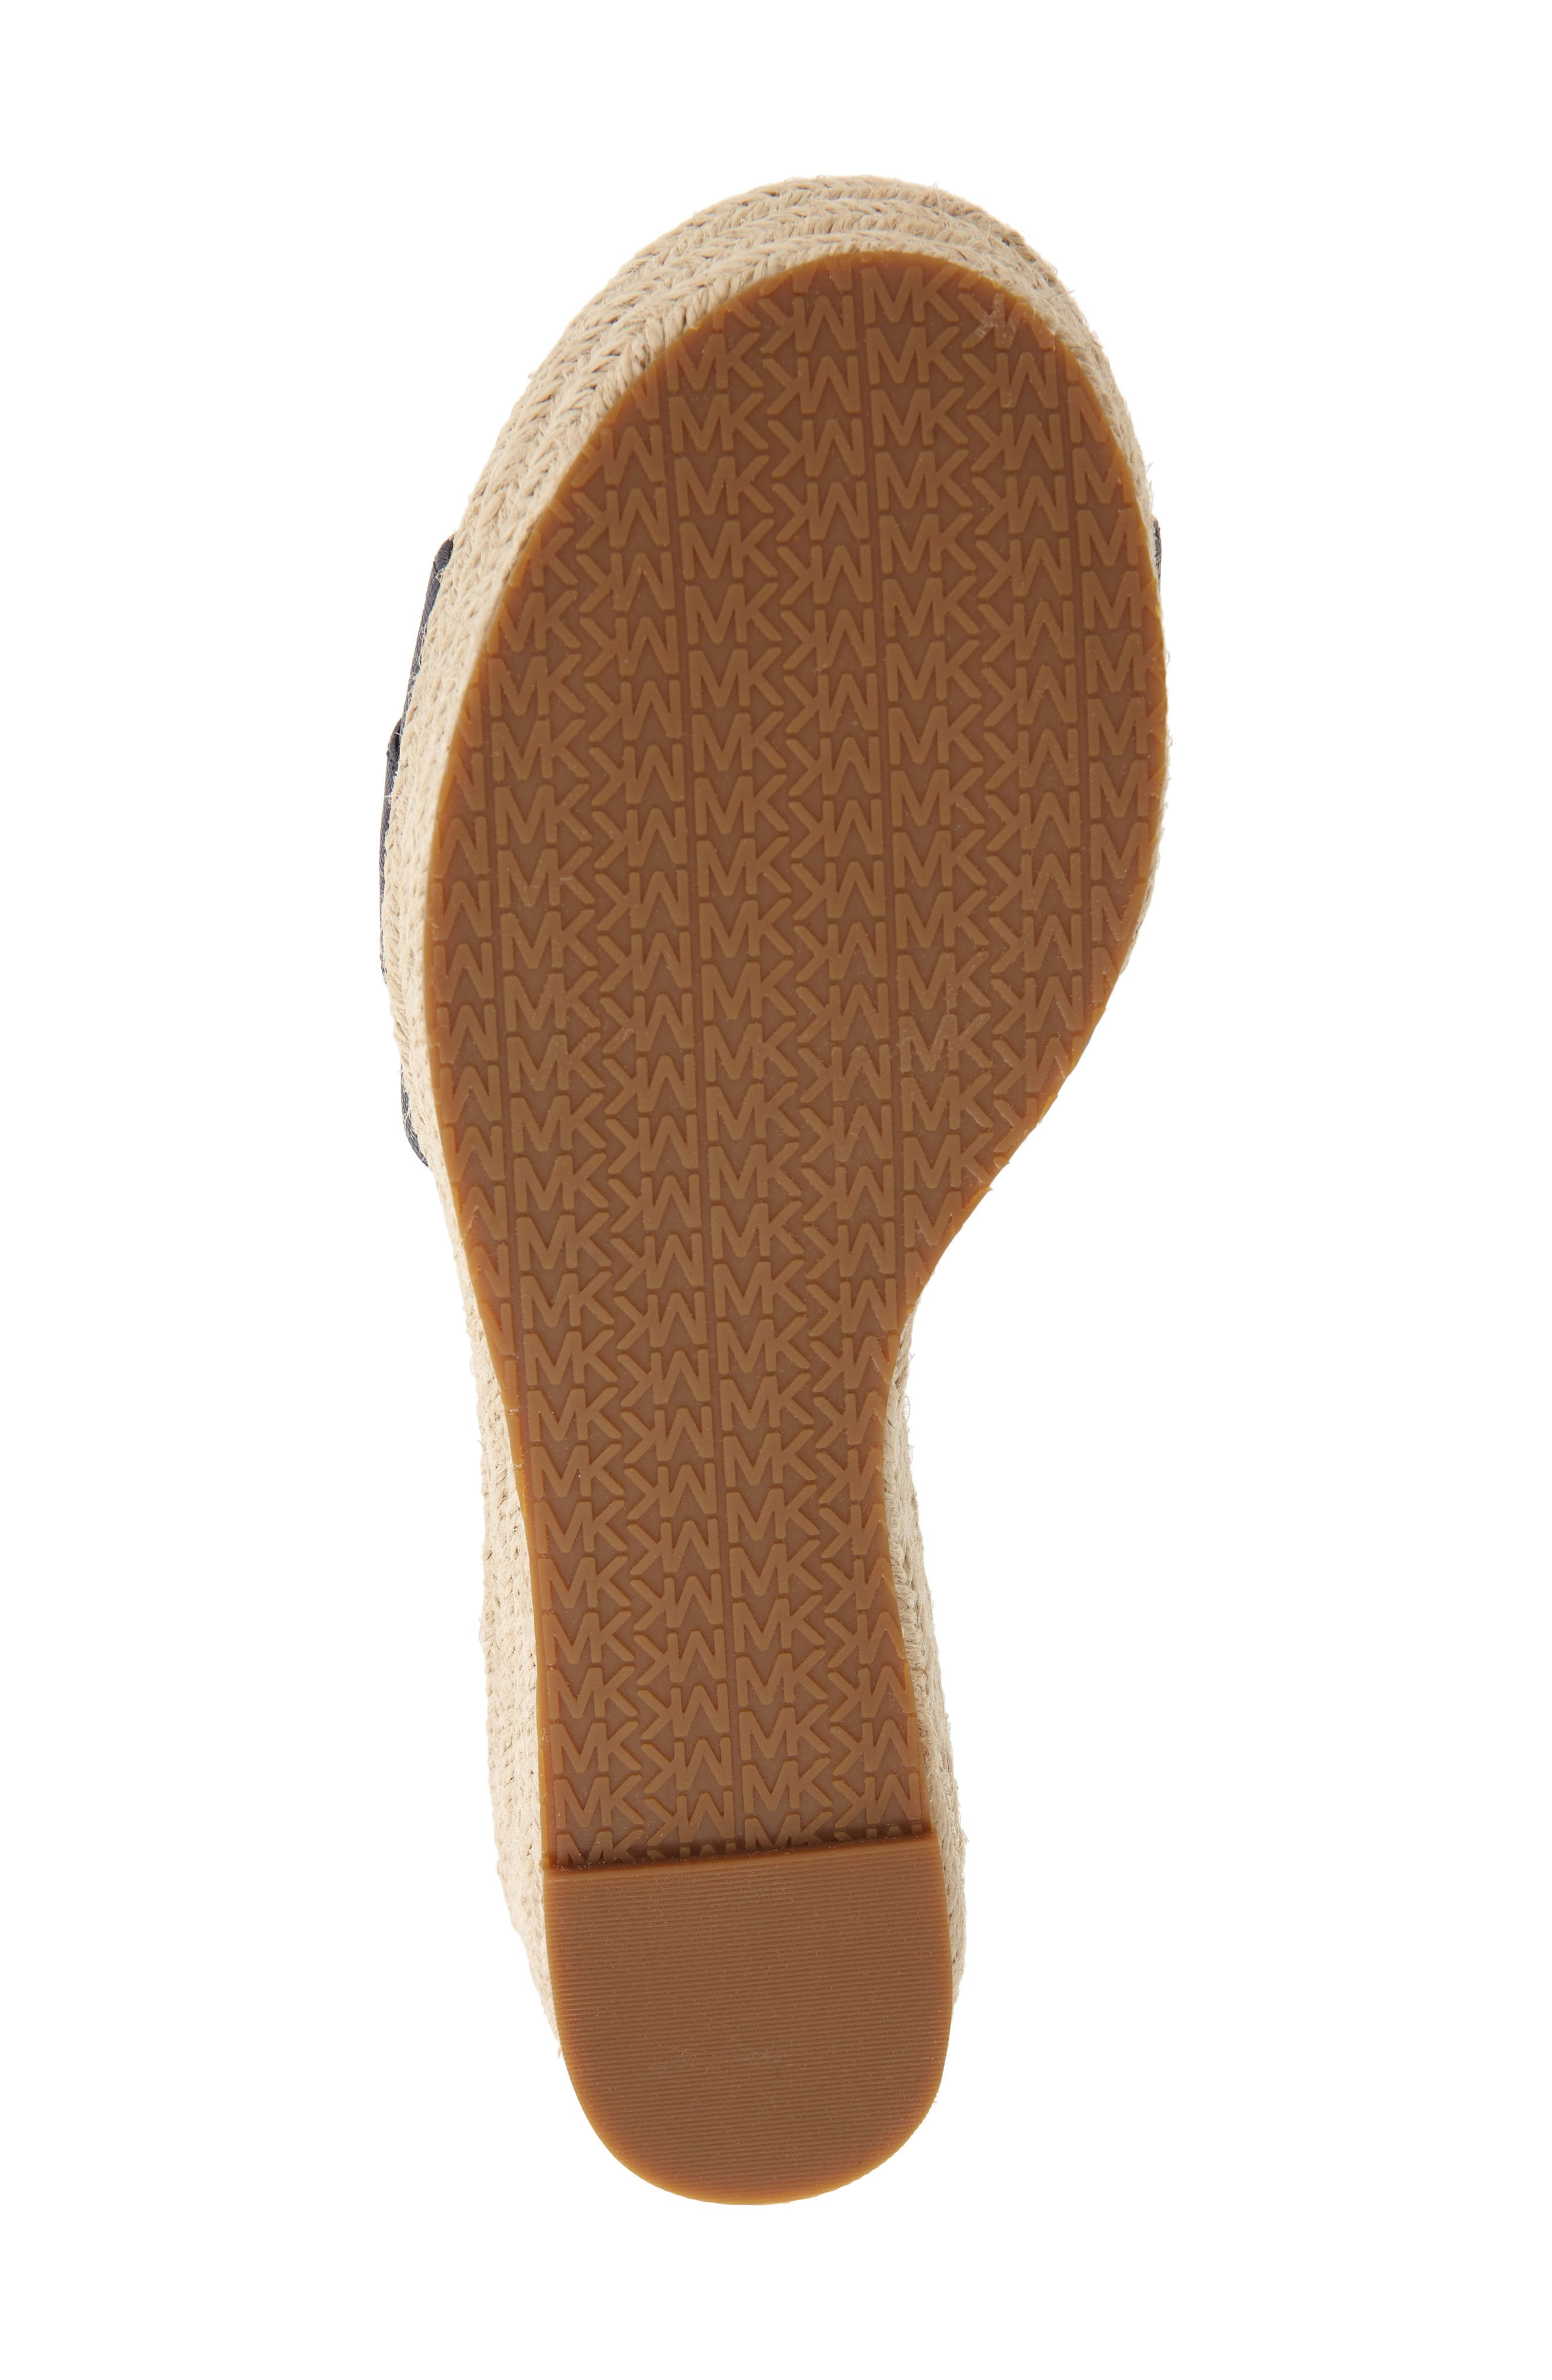 MICHAEL MICHAEL KORS, Brady Platform Slide Sandal, Alternate thumbnail 6, color, ADMIRAL SAFFIANO LEATHER